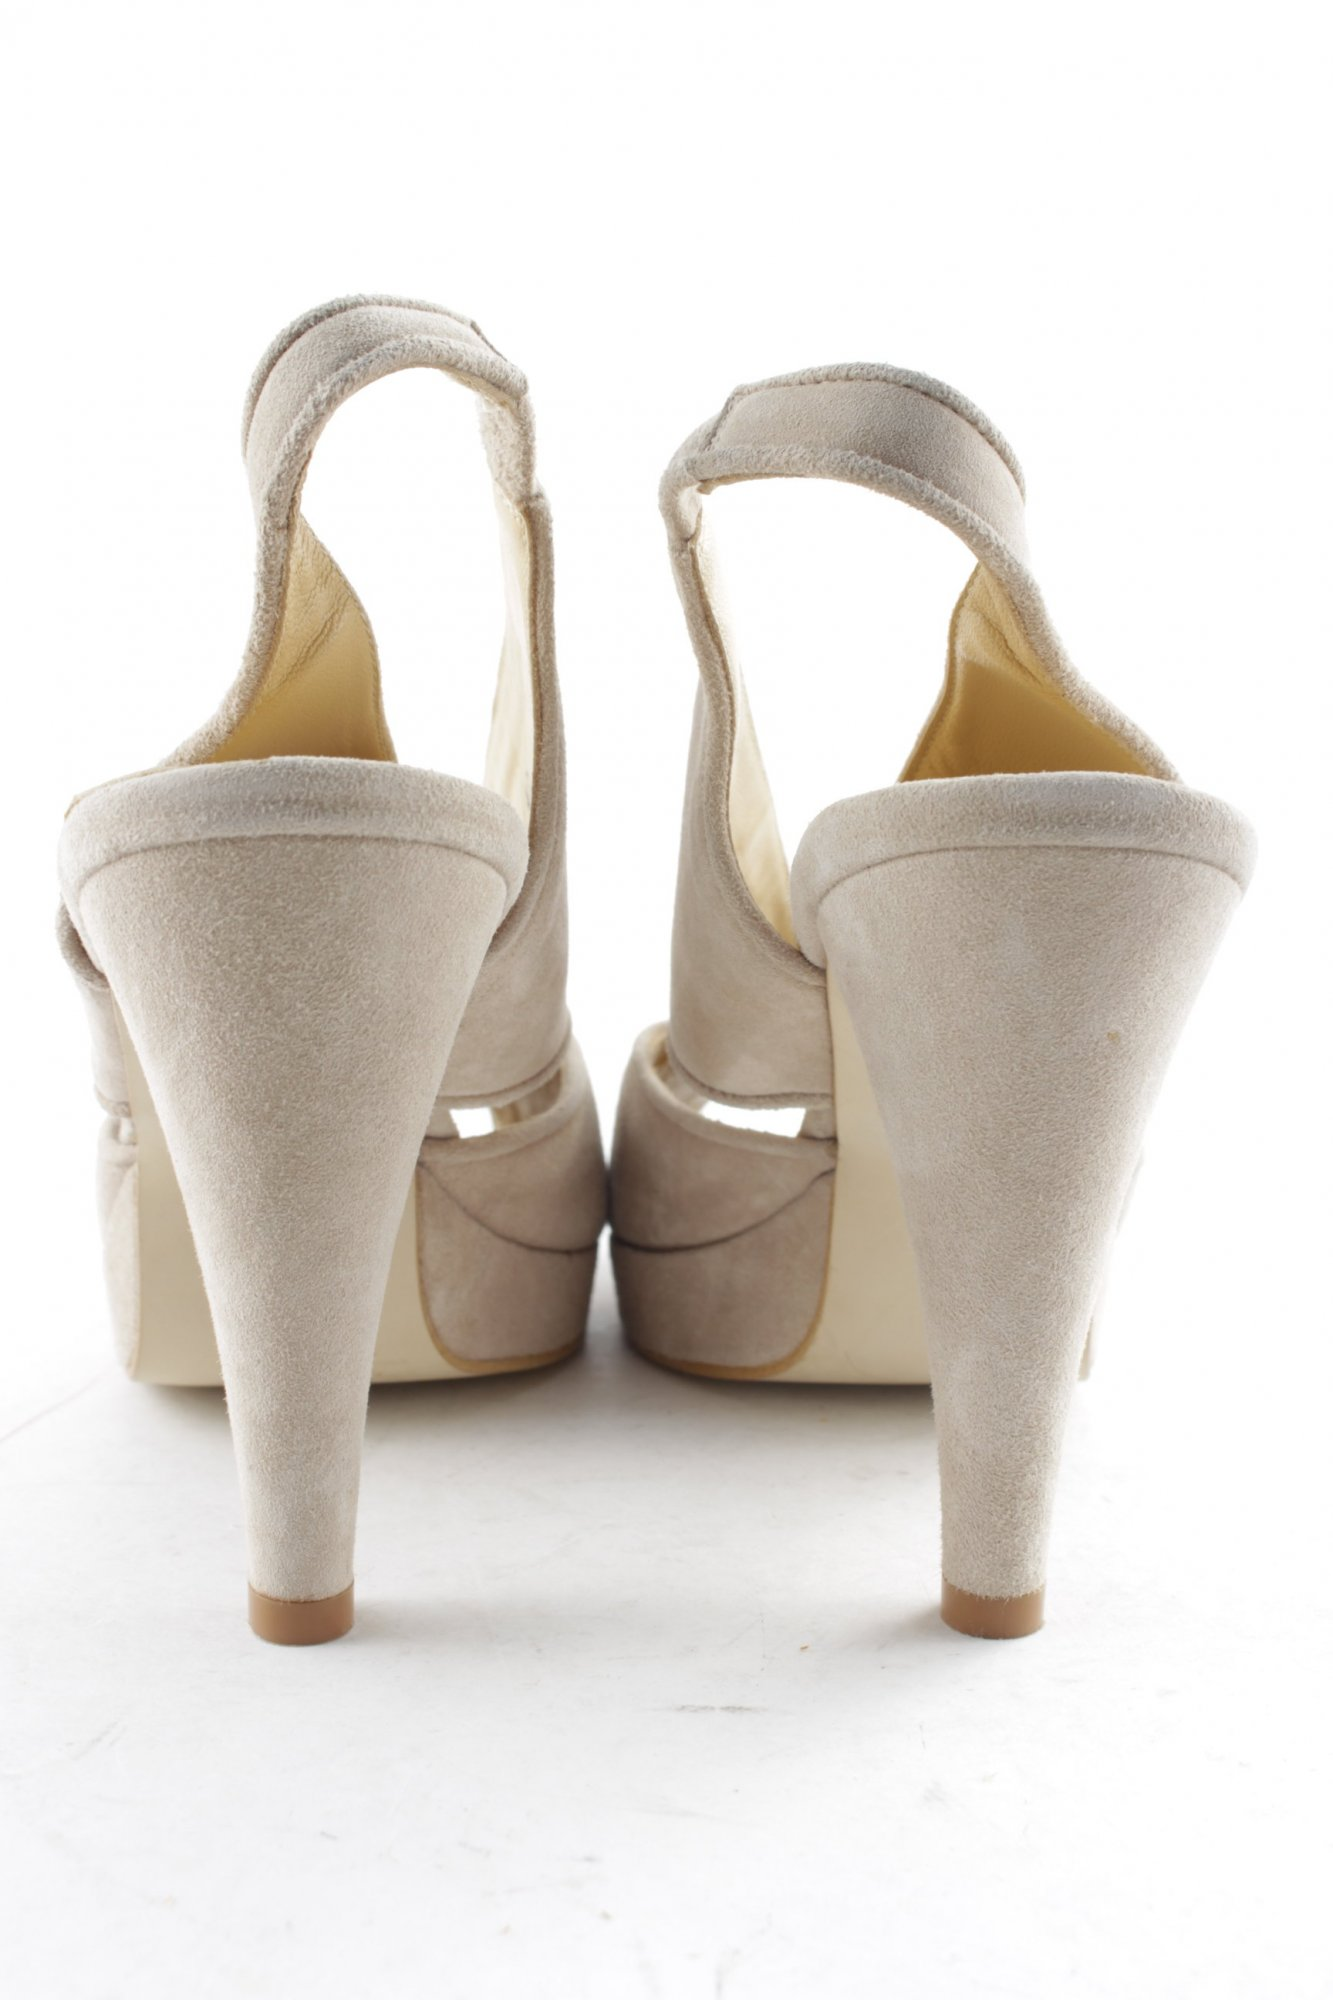 Scarpe sandali Pelle Beige Alba Moda Tg 4 37